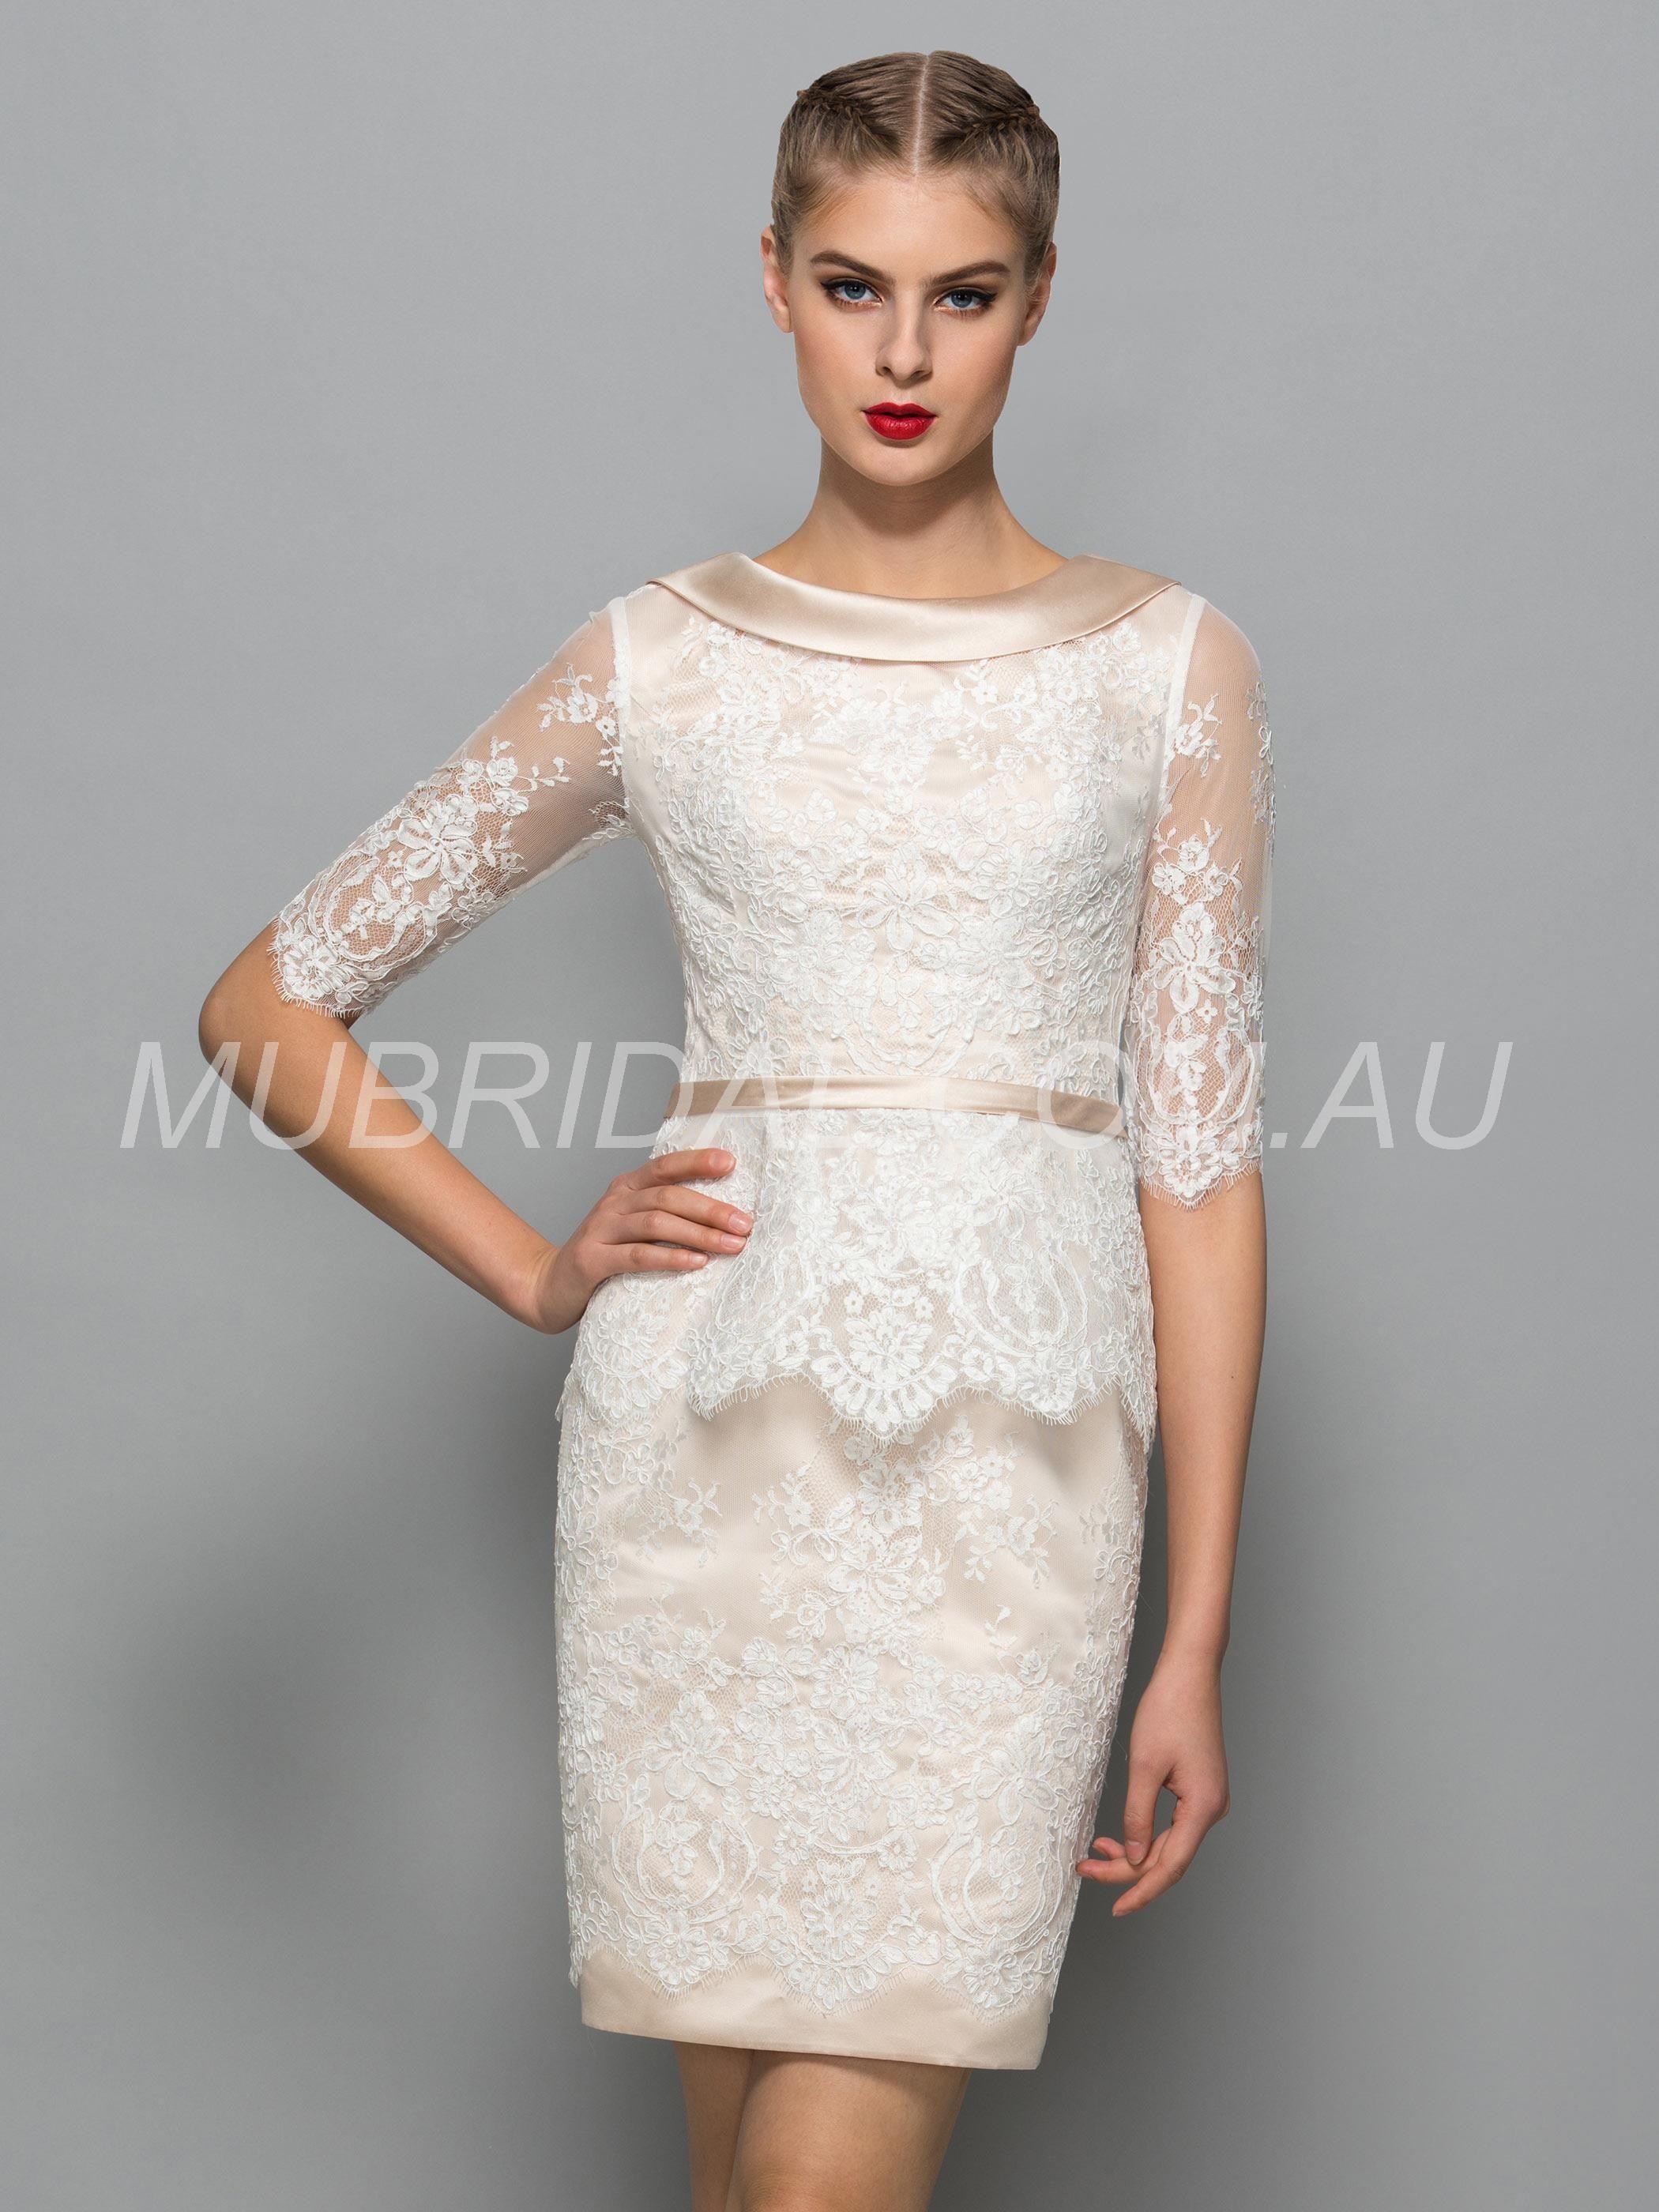 Mubridal Com Au Supplies White Elegant Luxurious Spring Short Mini Formal Wedding Party Classic Timeless Celebrity Dresses Cocktail Dress Celebrity Dresses [ 2800 x 2100 Pixel ]